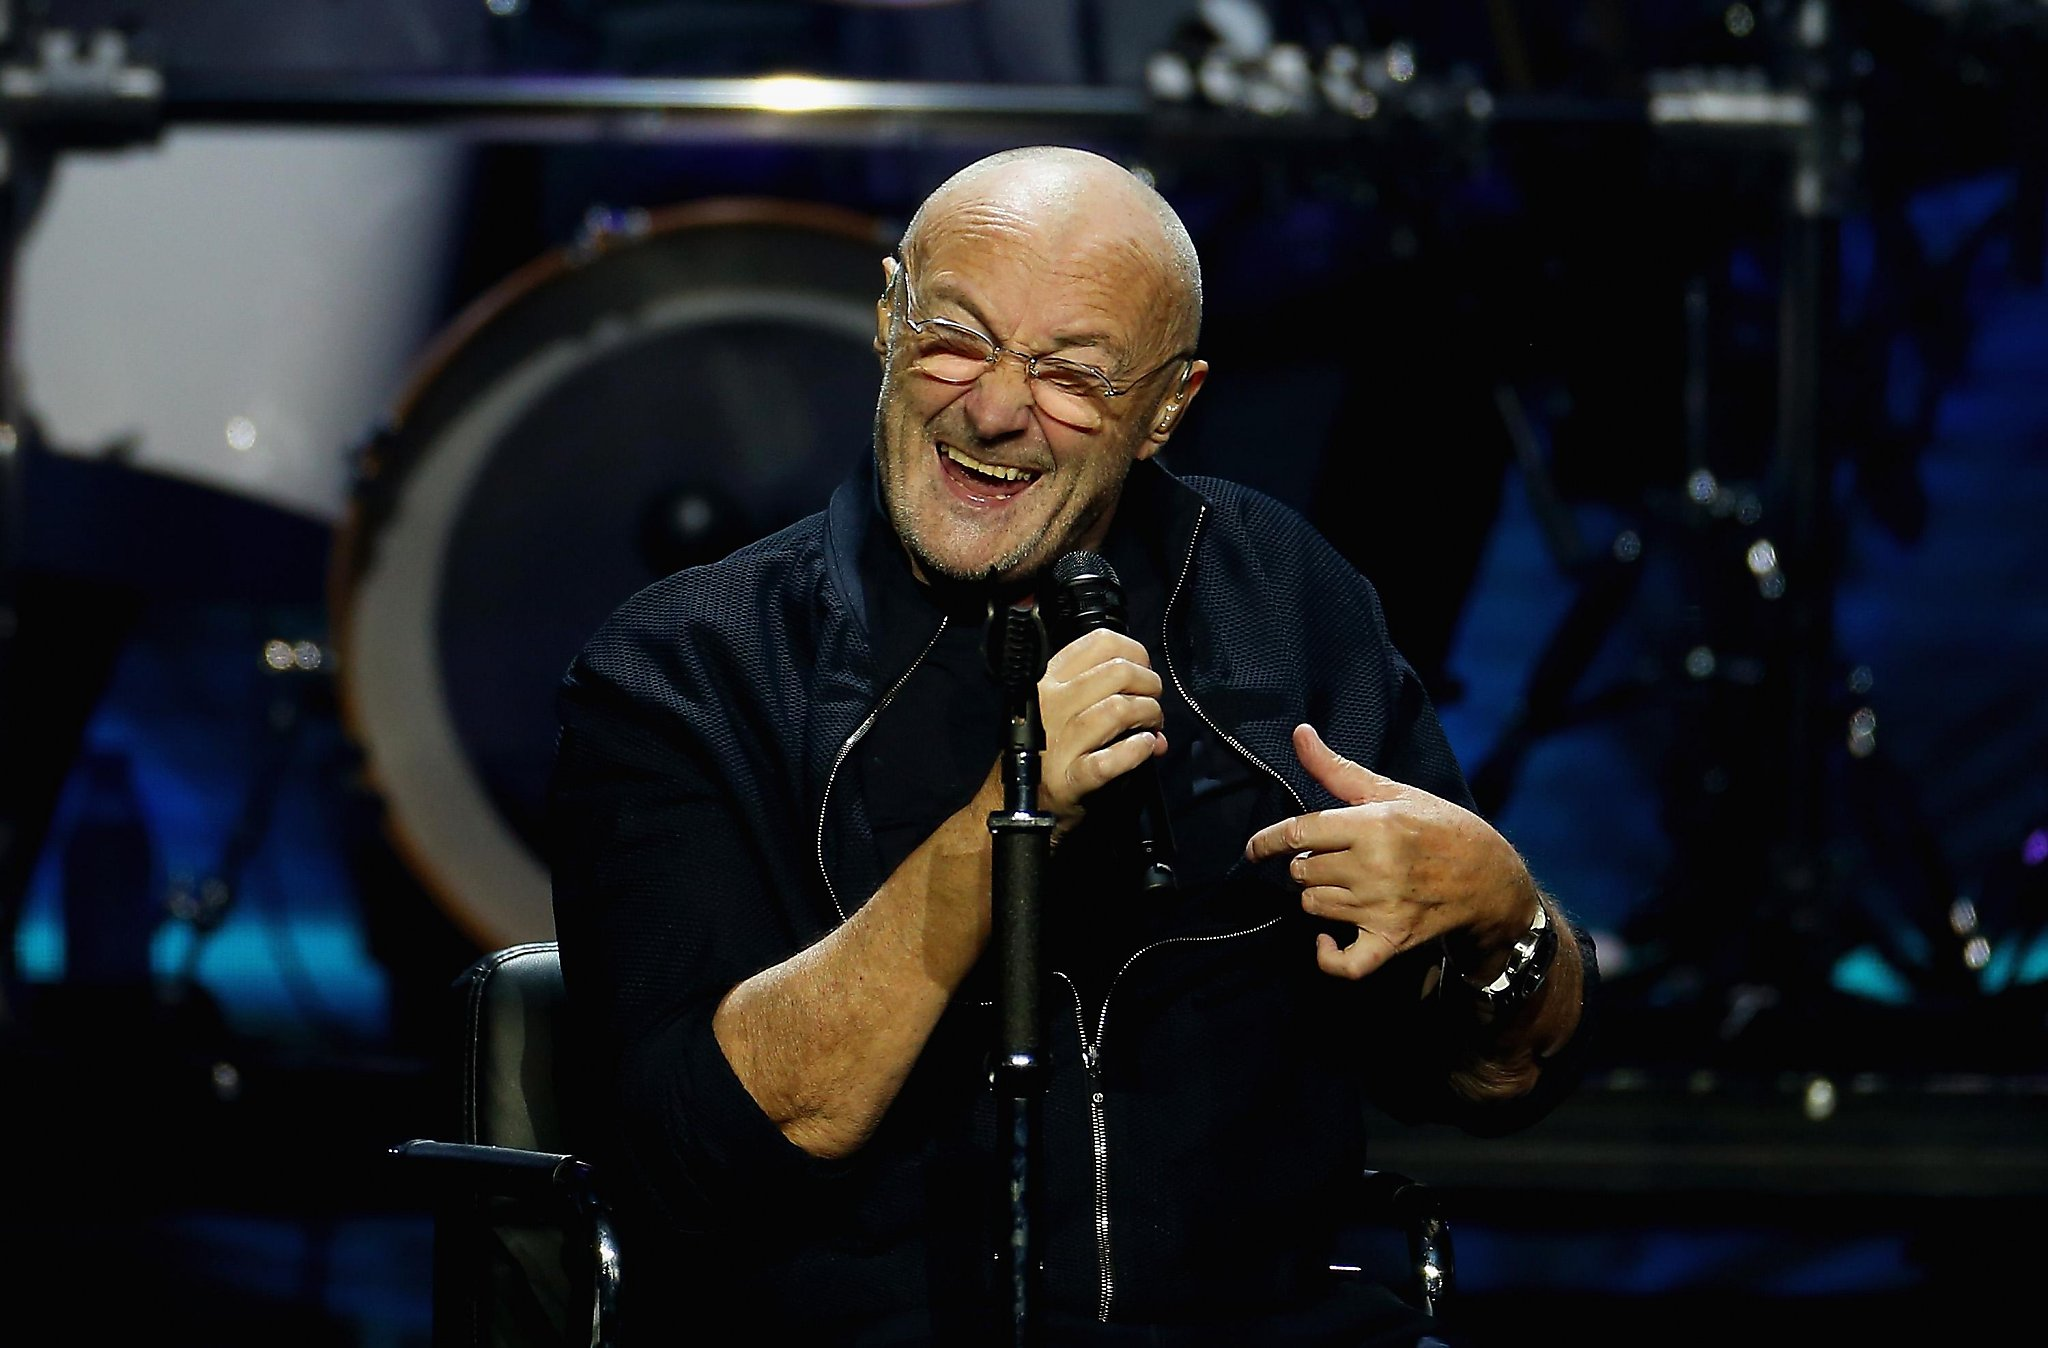 Celebrated Alamo patron Phil Collins skipping San Antonio during concert tour